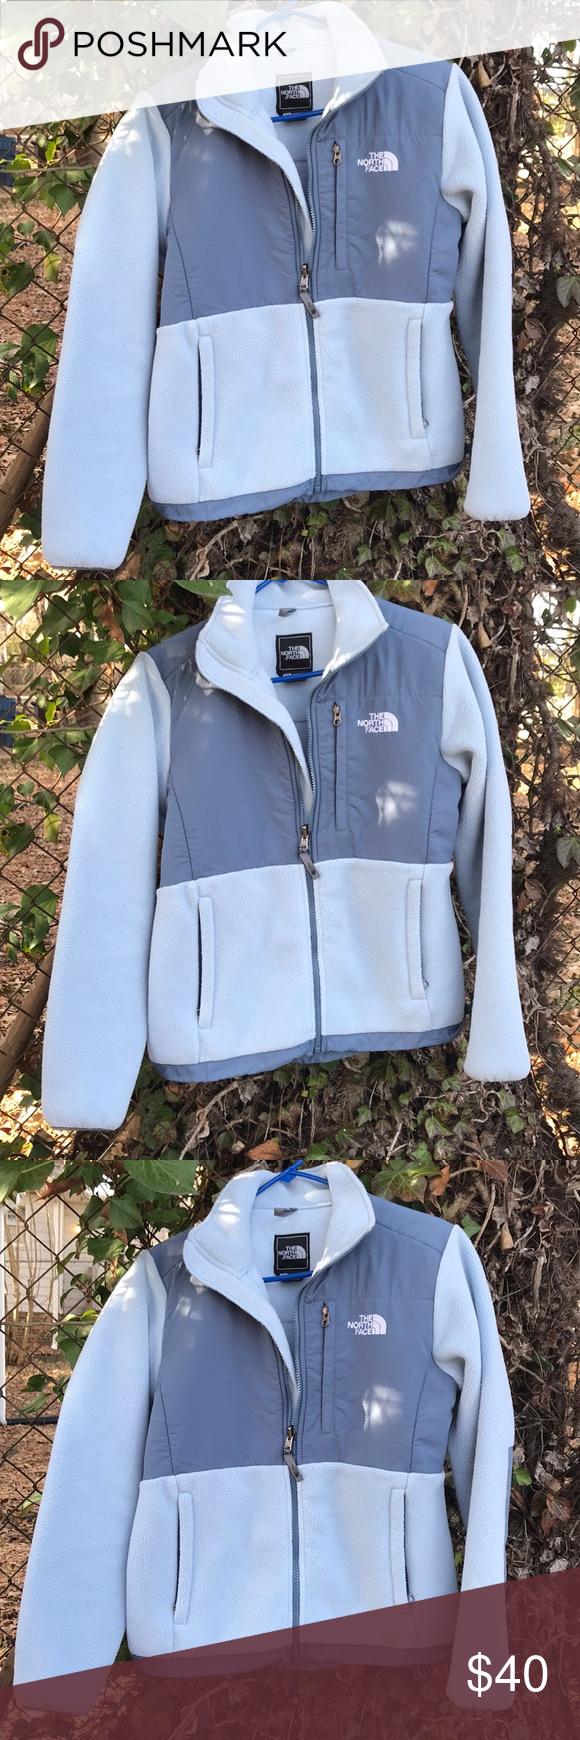 North Face Denali Baby Blue Fleece Jacket The North Face Fleece Jacket North Face Jacket [ 1740 x 580 Pixel ]